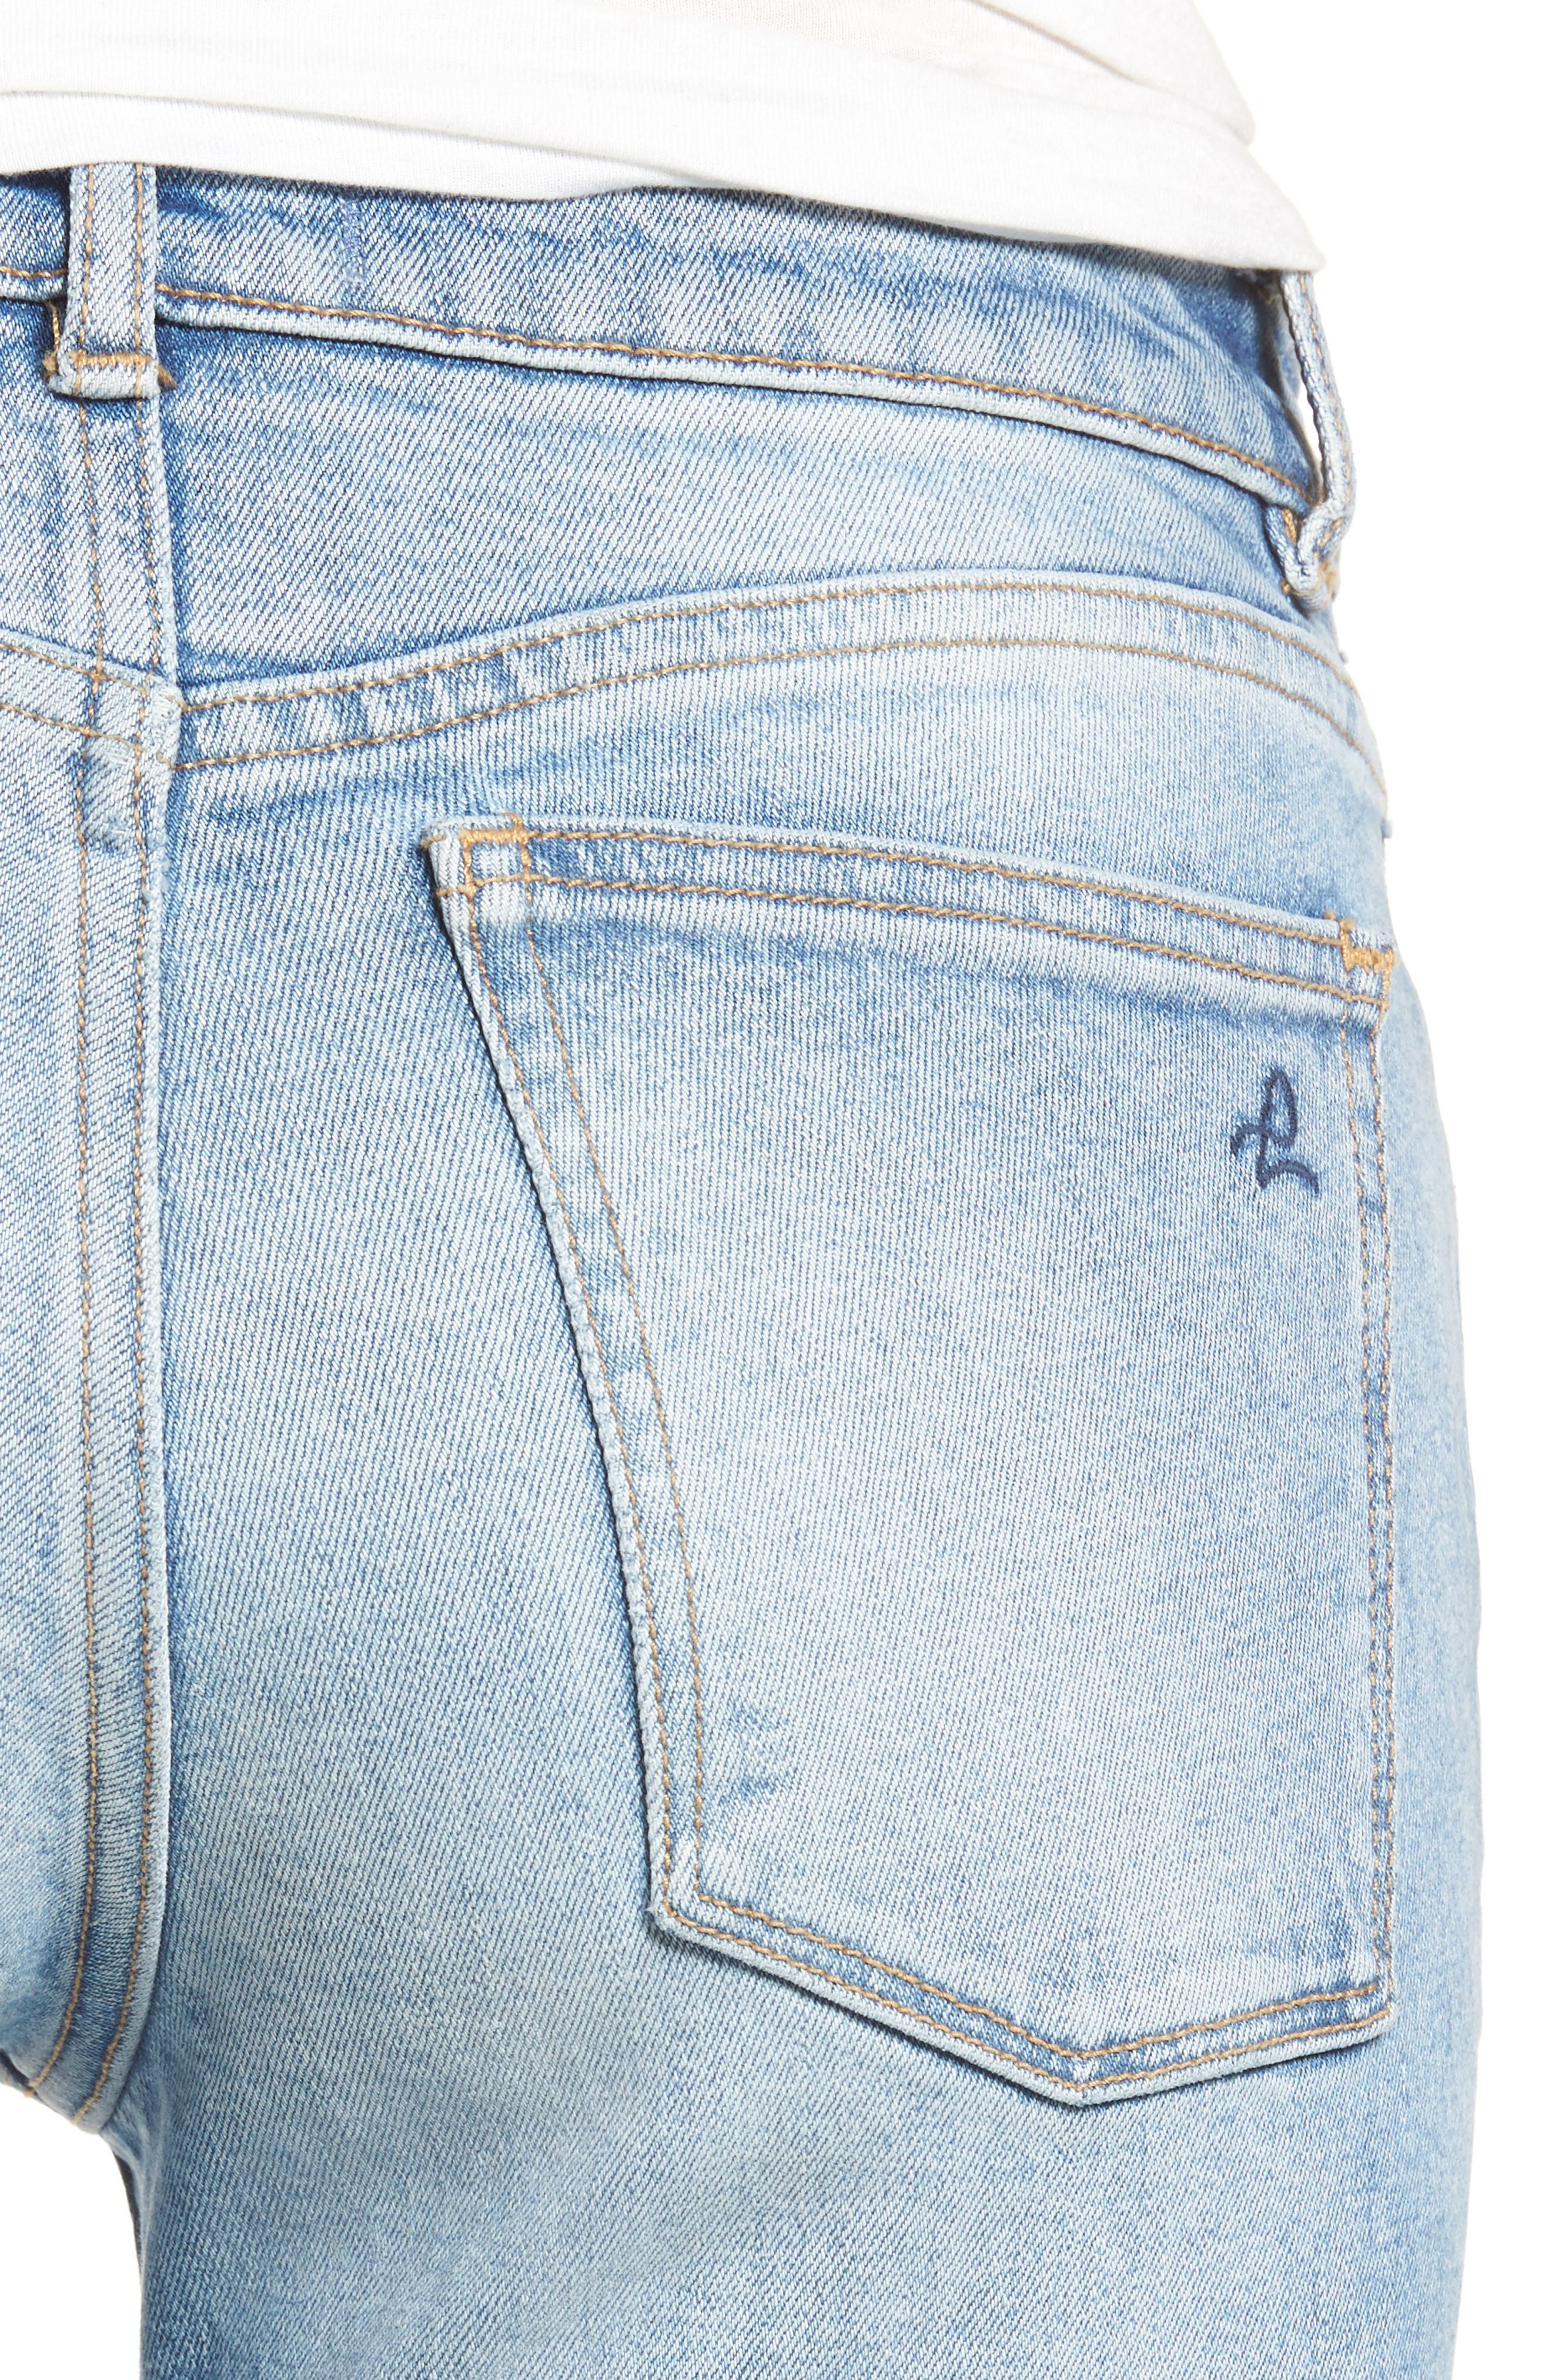 Margaux Instasculpt Ankle Skinny Jeans,                             Alternate thumbnail 4, color,                             430